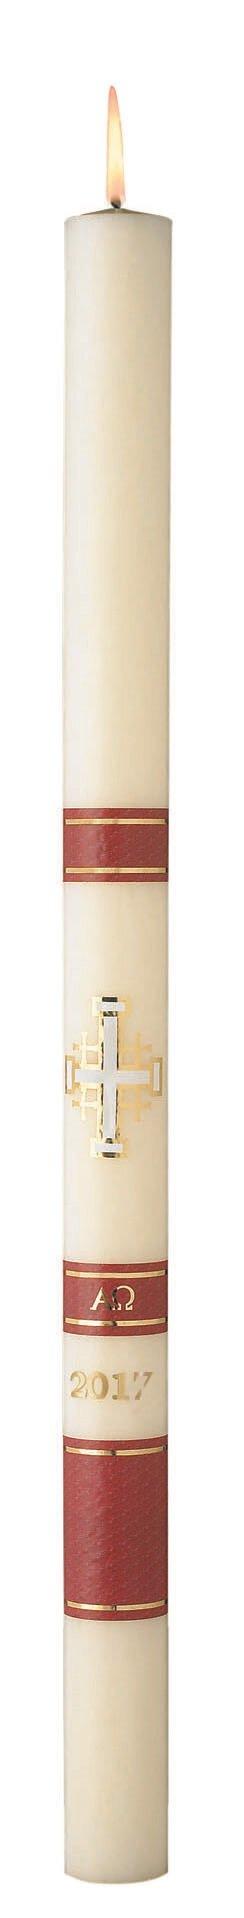 No 9 Jerusalem Paschal Candle